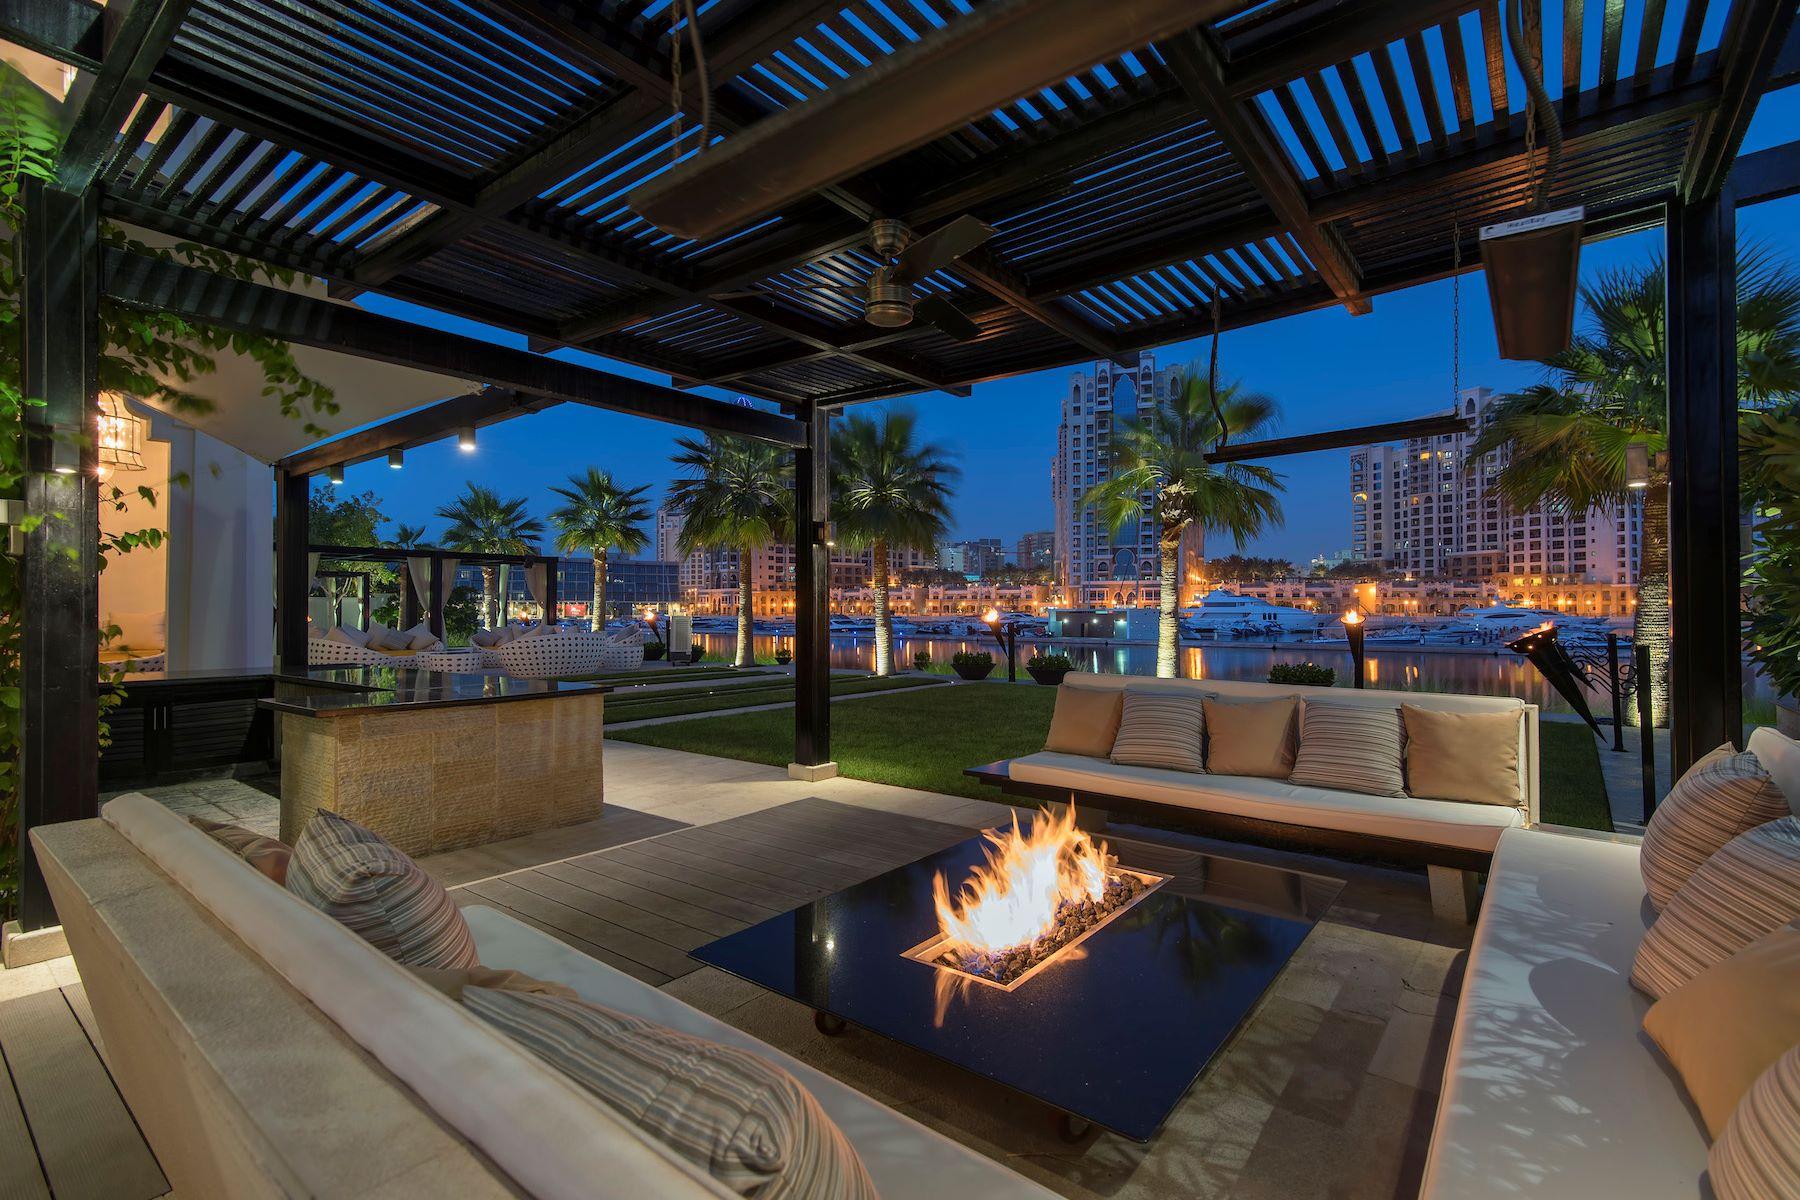 Single Family Home for Sale at Italian Luxury Beachfront Living Dubai, United Arab Emirates